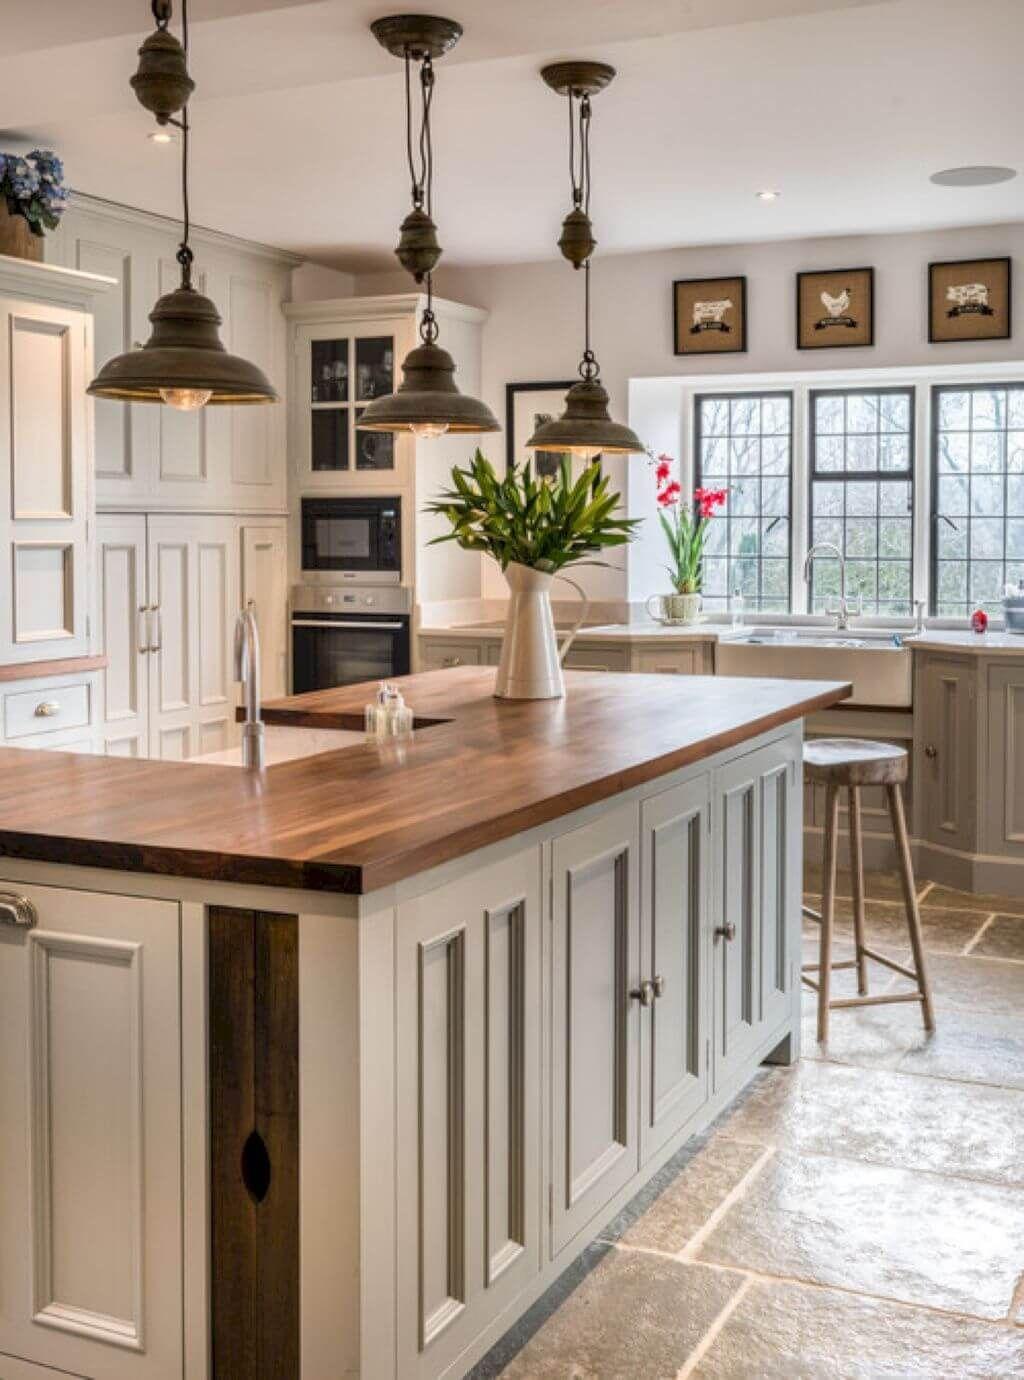 French Oak Kitchen Cabinets 2021 In 2020 Kitchen Backsplash Designs Home Decor Kitchen Farmhouse Style Kitchen